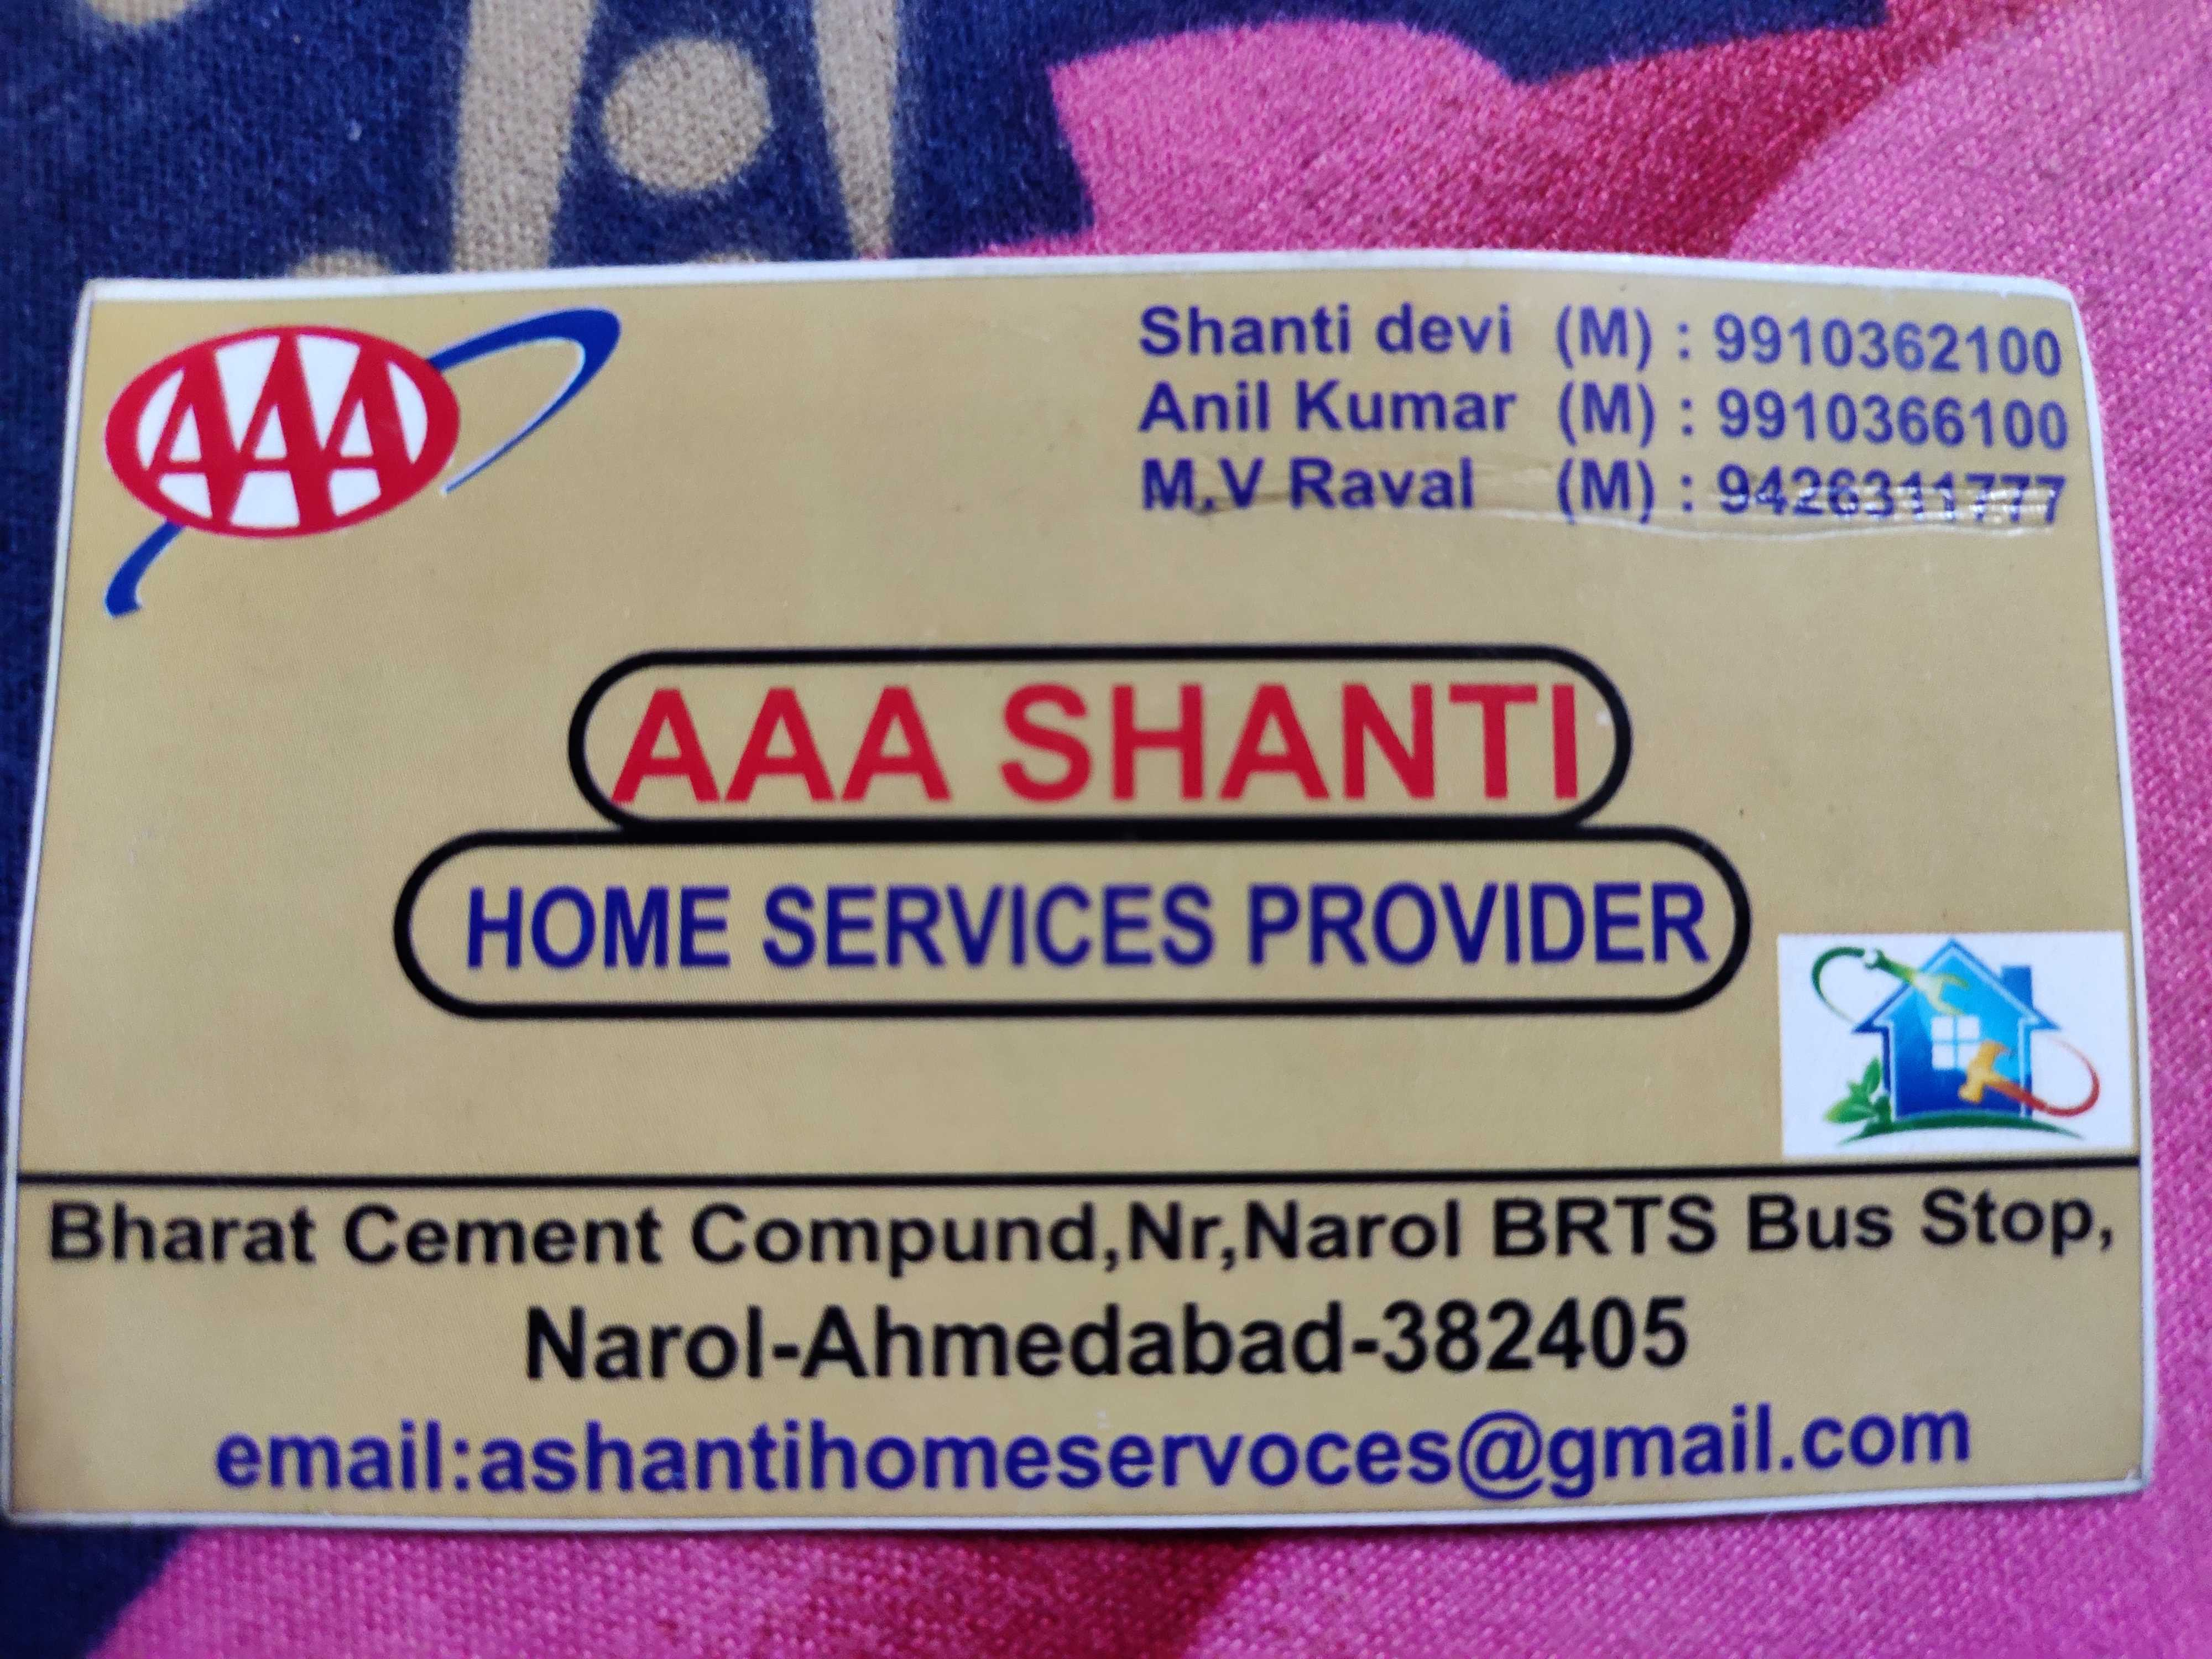 Maids, House Maid Services near me | Sulekha